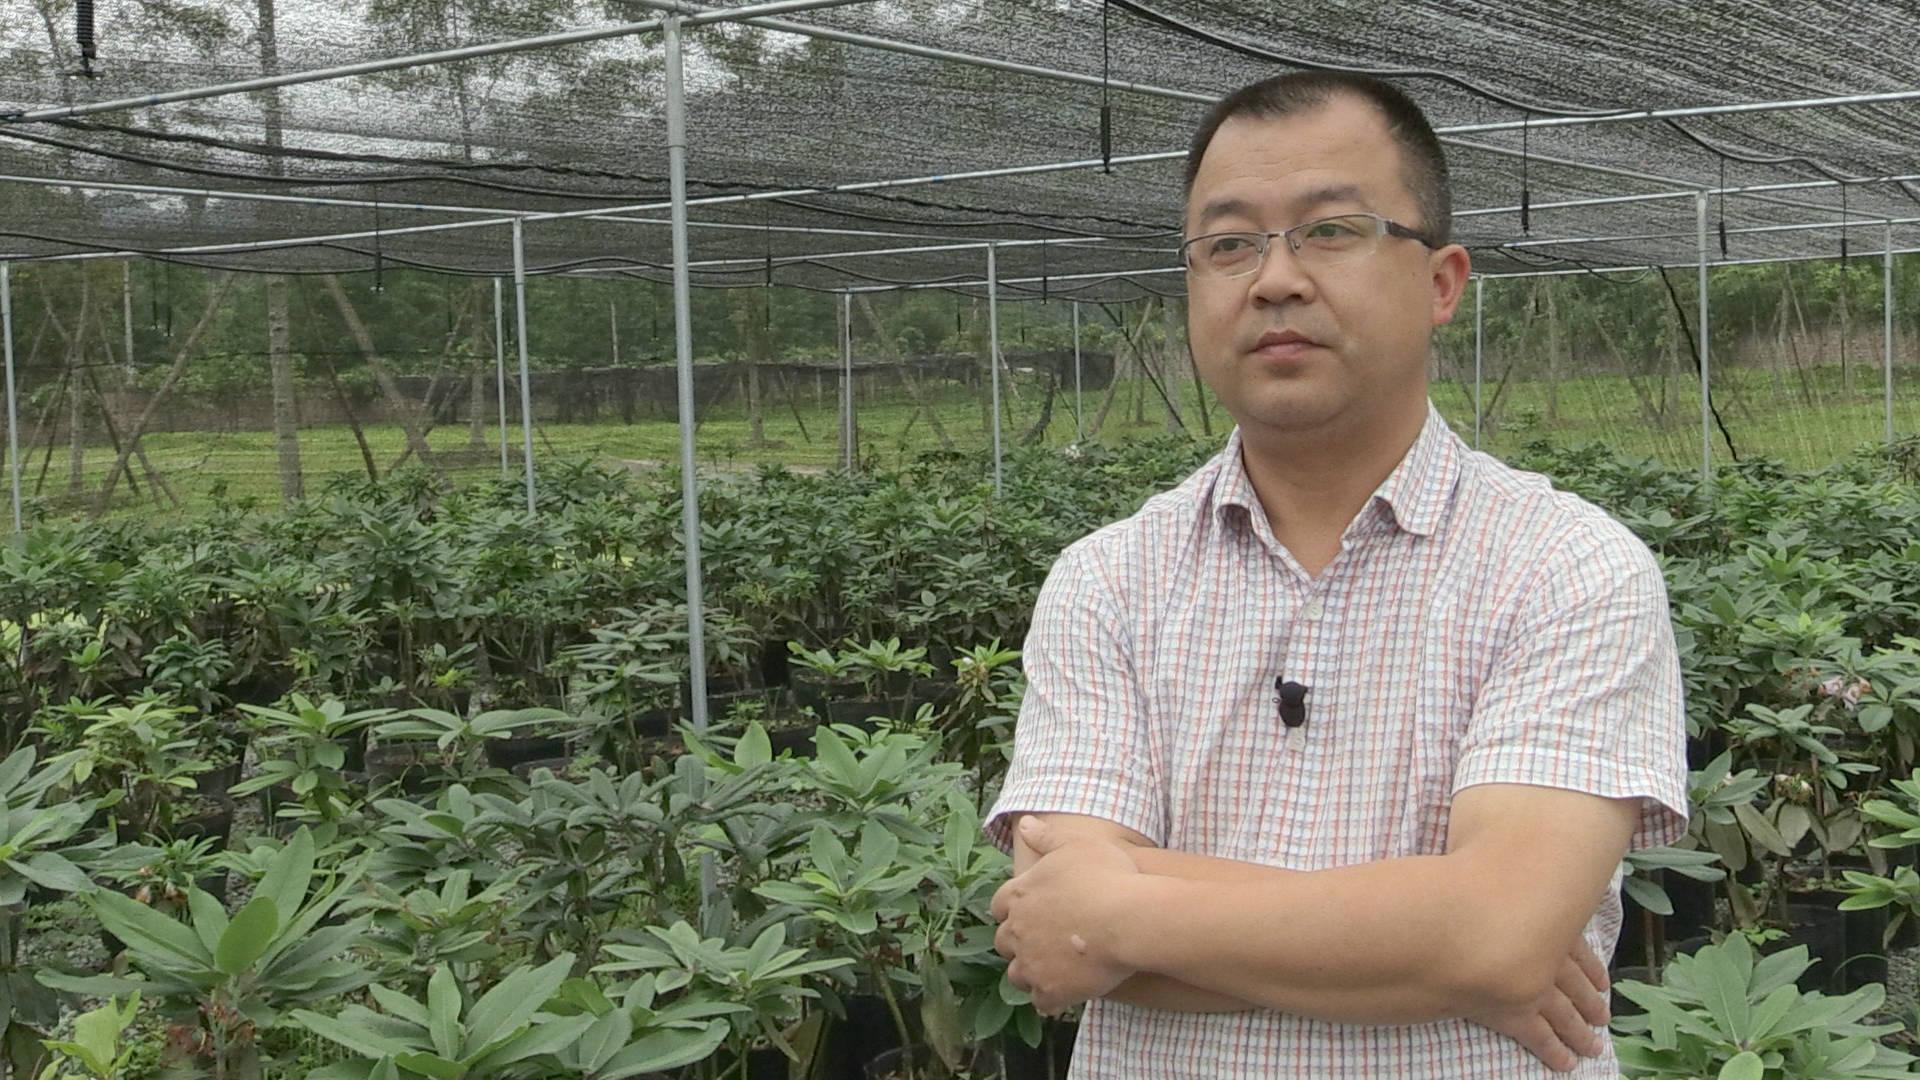 Zhang Chao   Botanist   Zhang Chao is the associate director of the Huaxi Subalpine Botanic Garden, Sichuan Province.